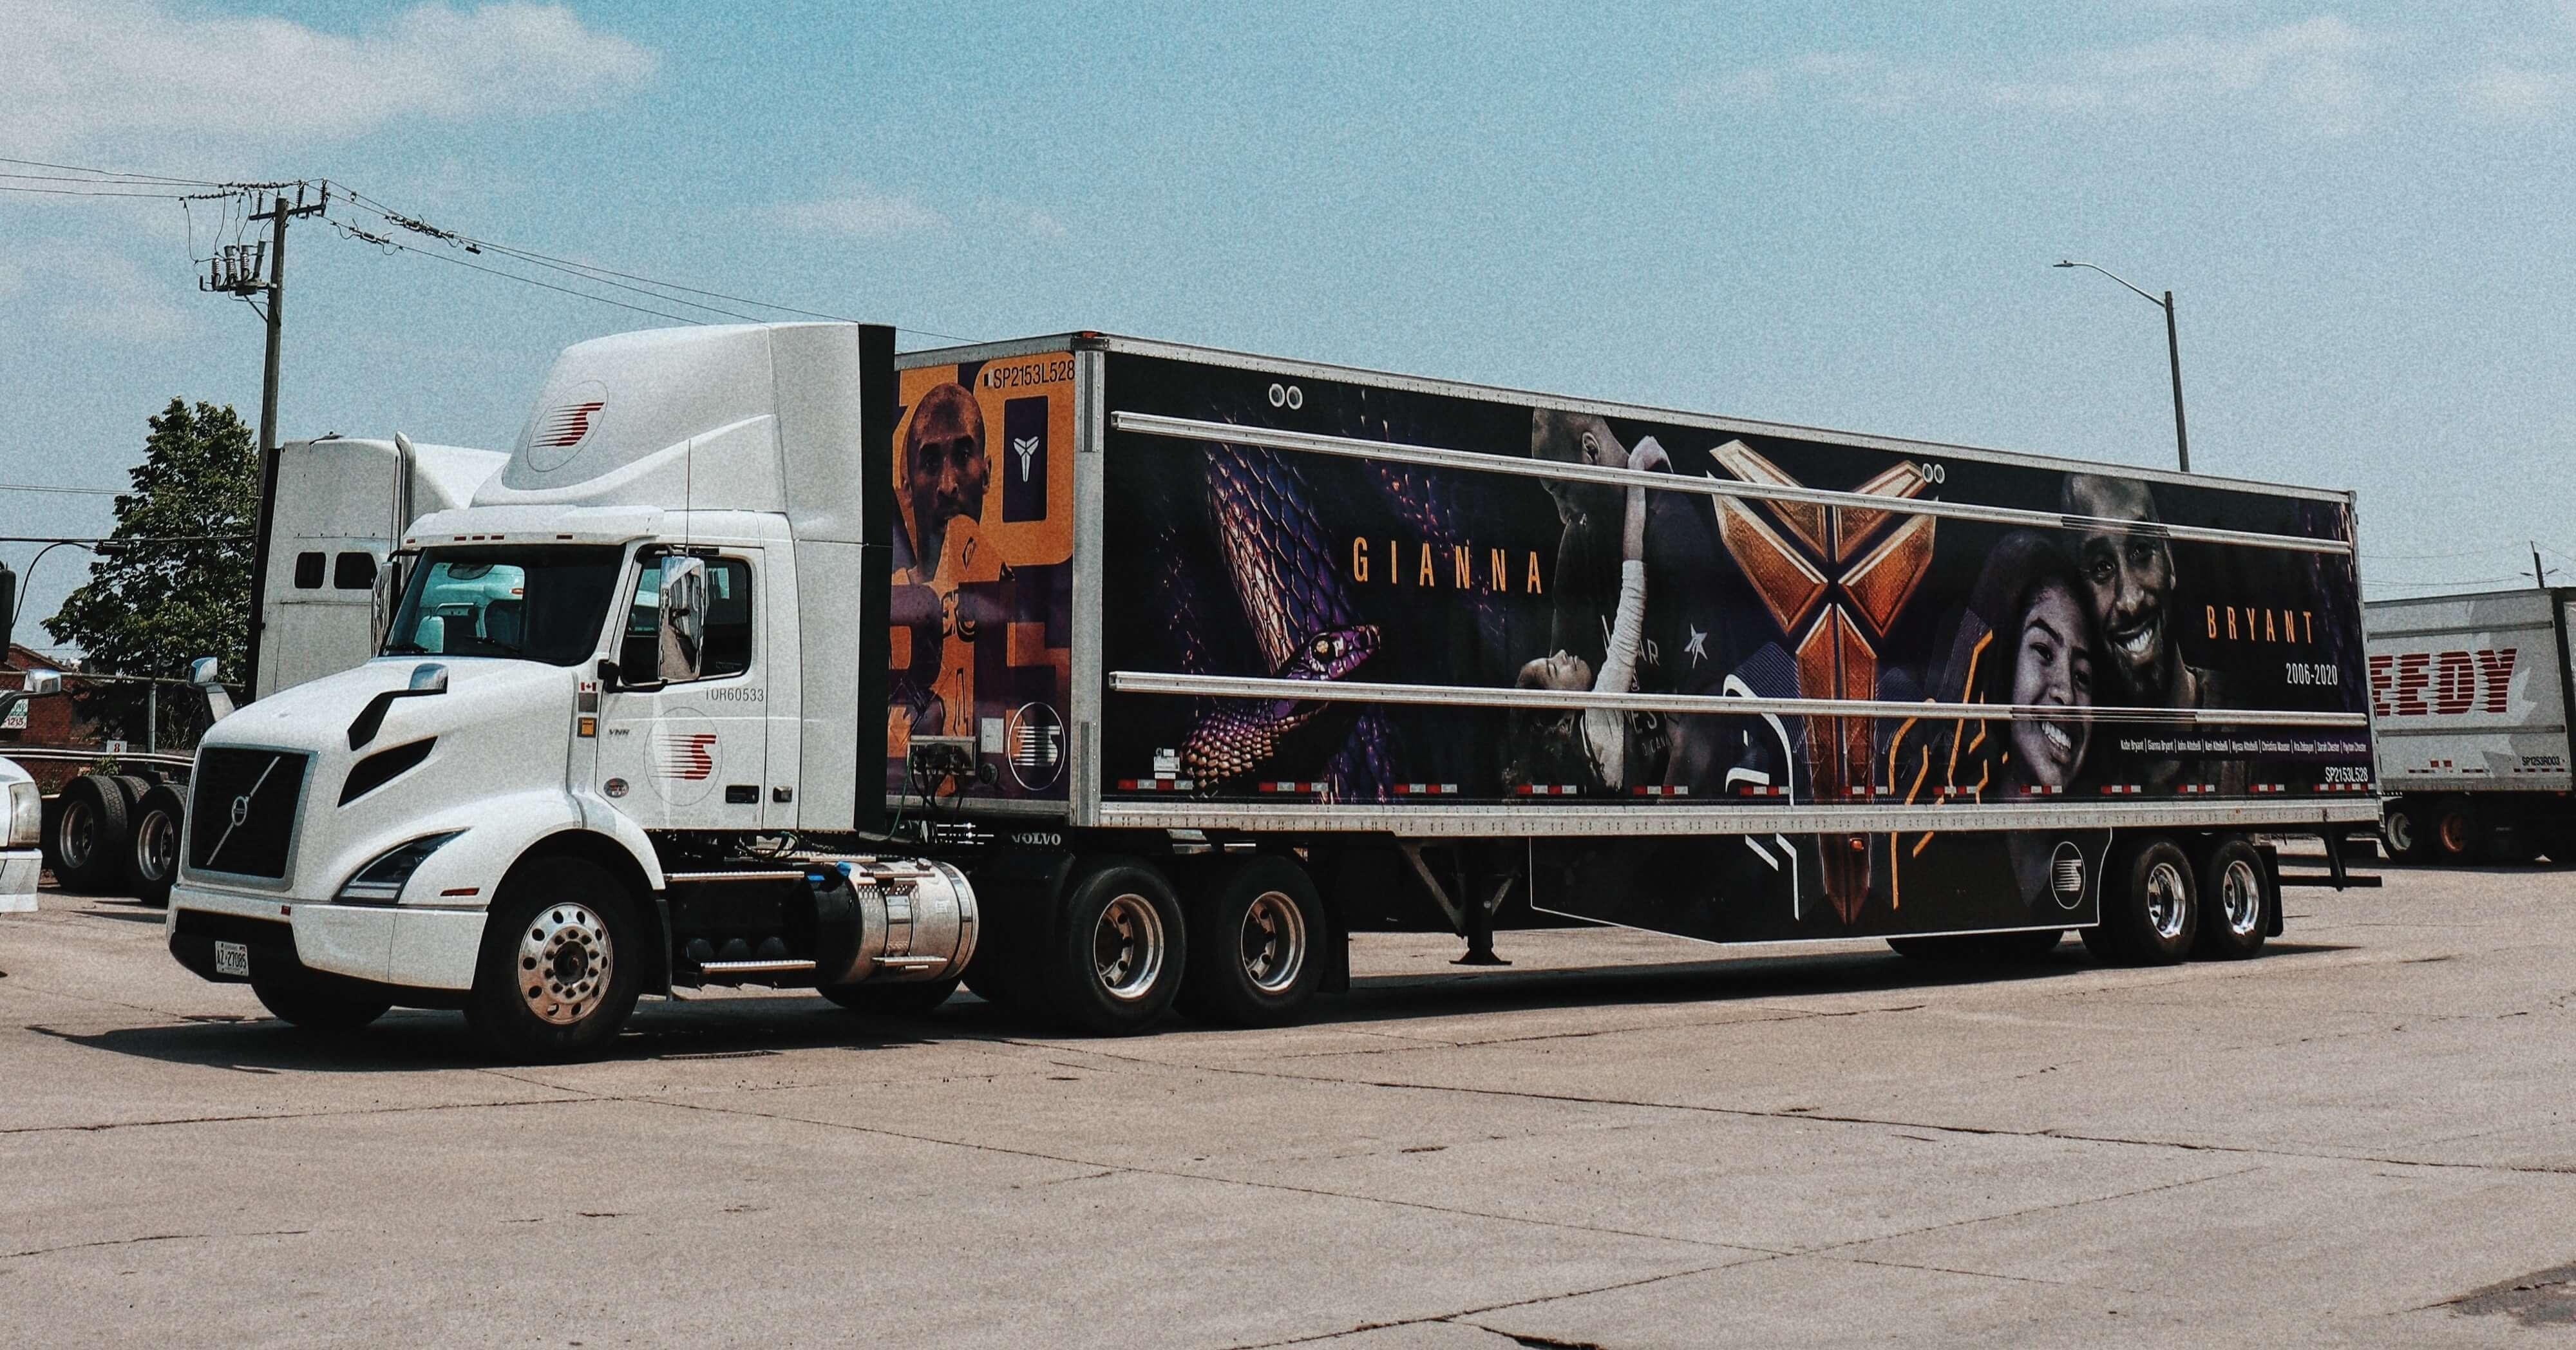 Habillage de camion Kobe Bryant gagnant du prix 3M PMTC